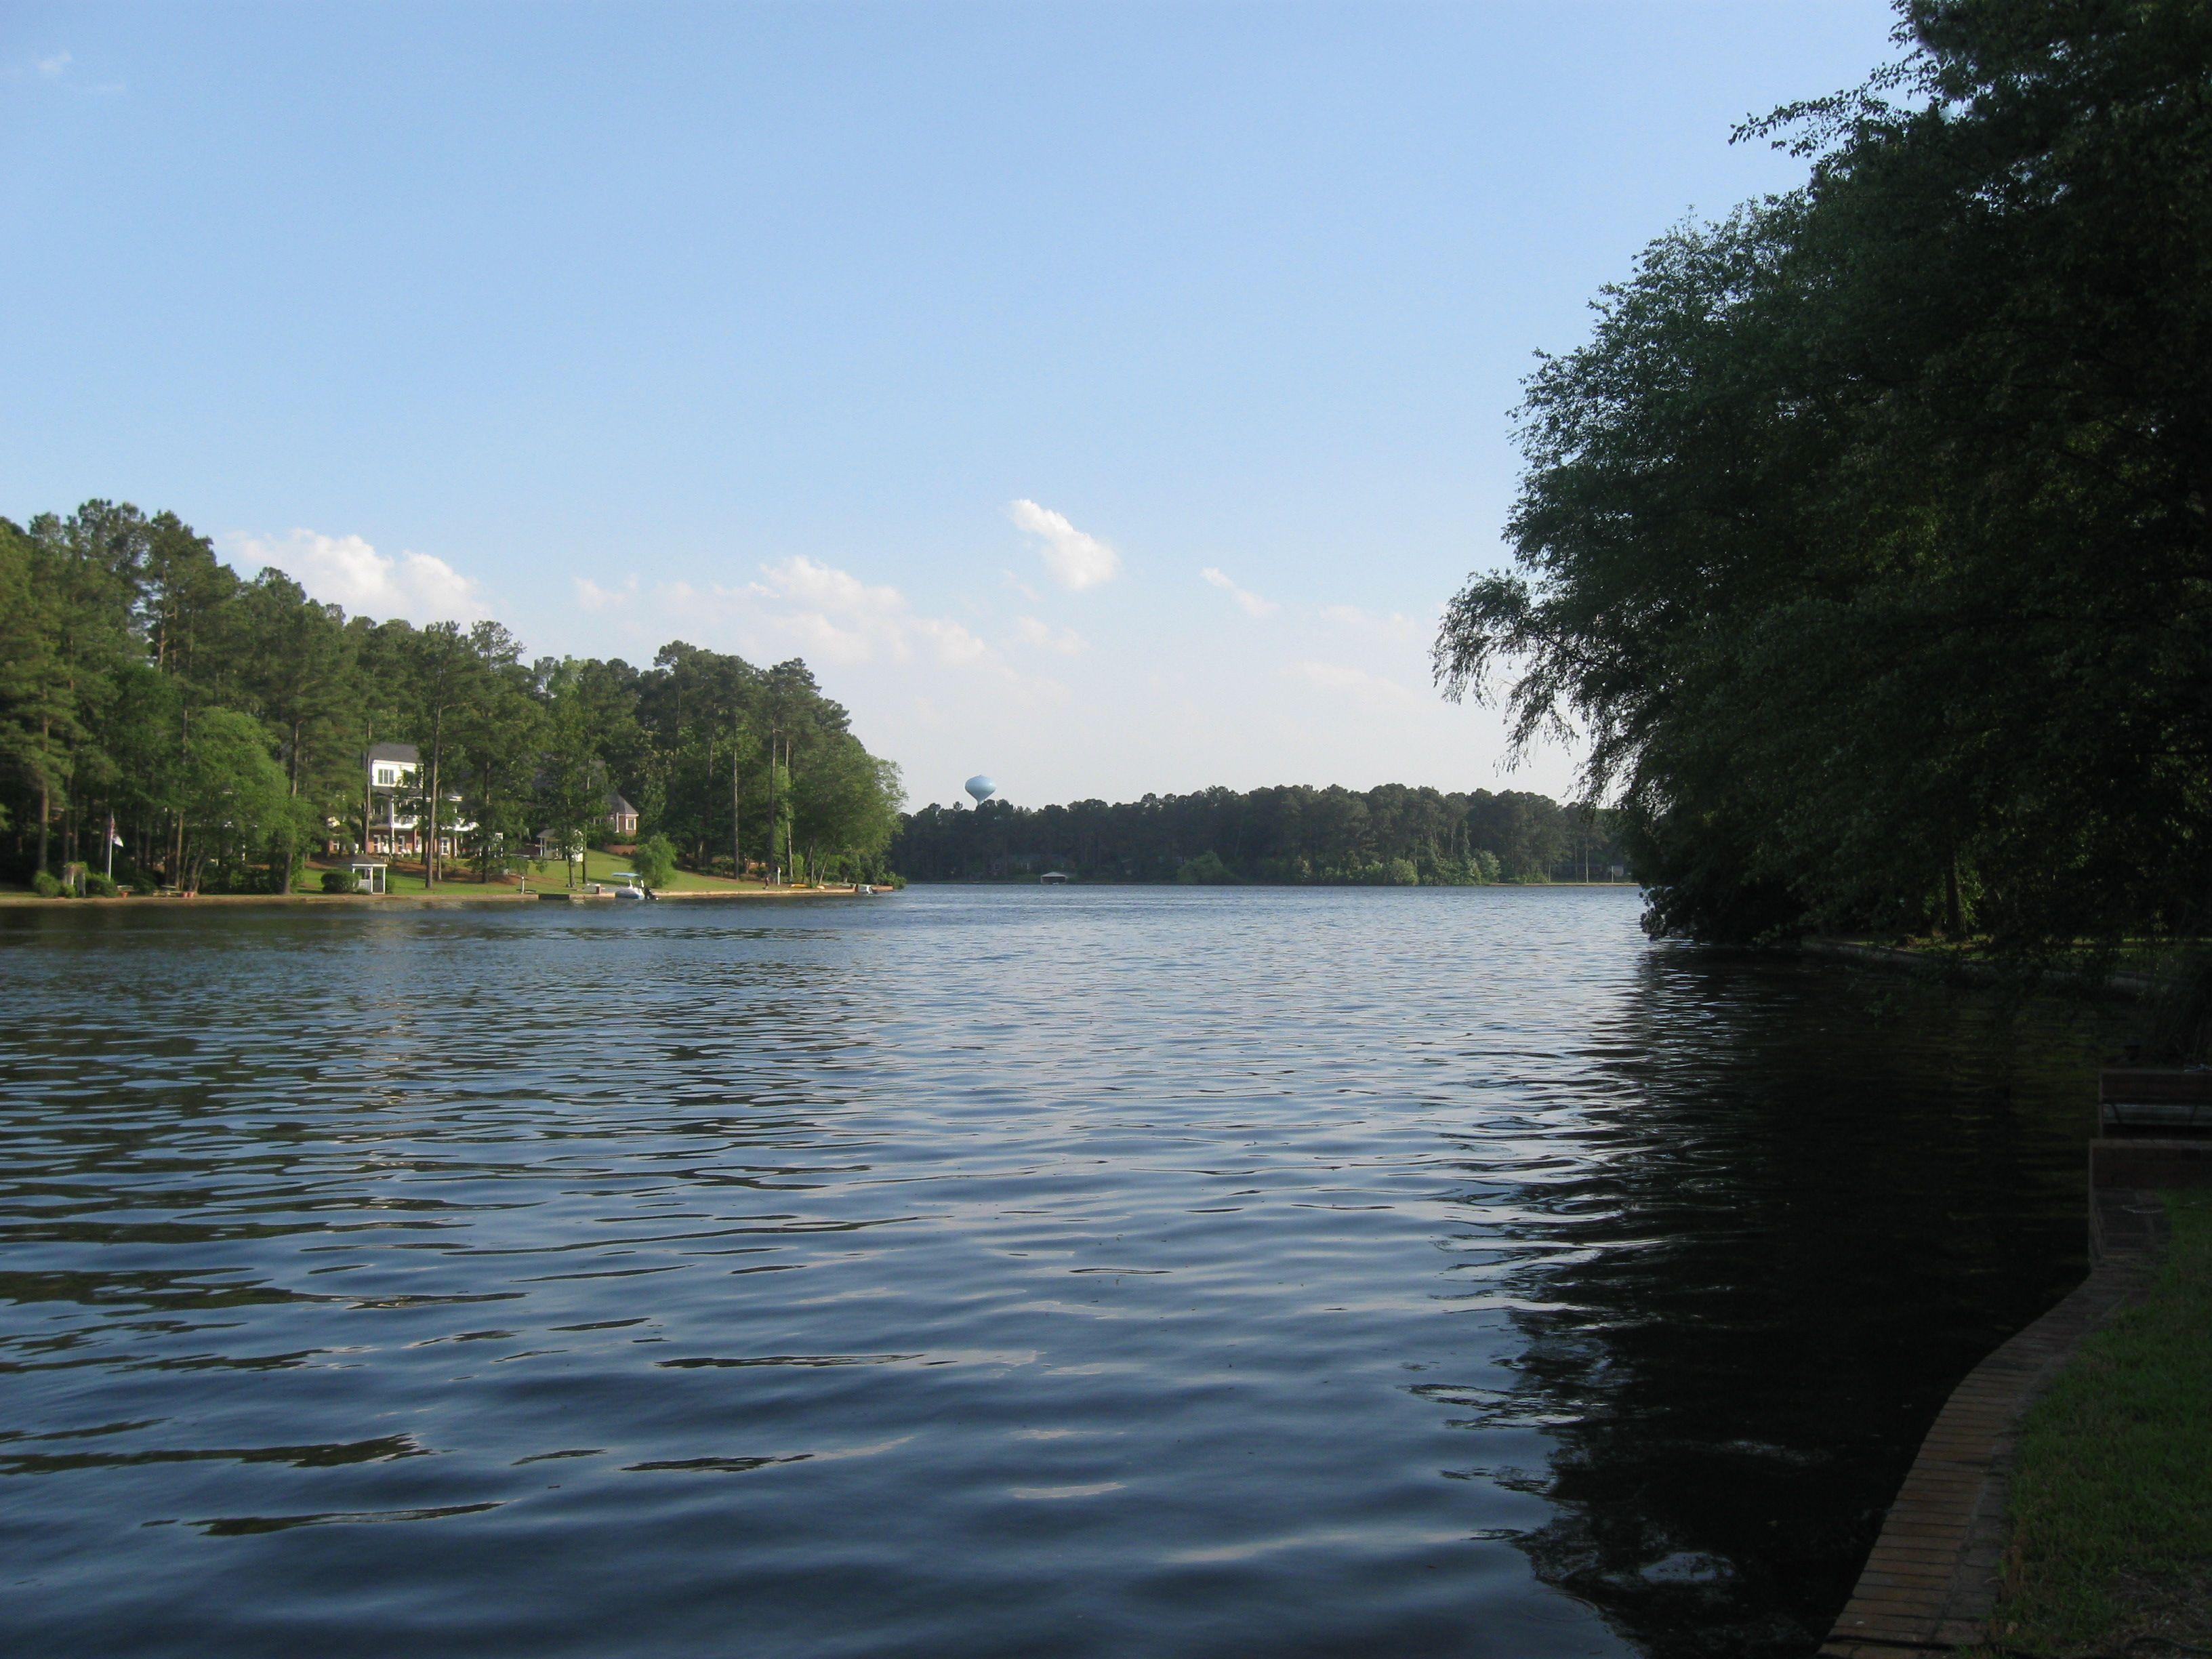 Lake Wakena, Walnut Creek, NC